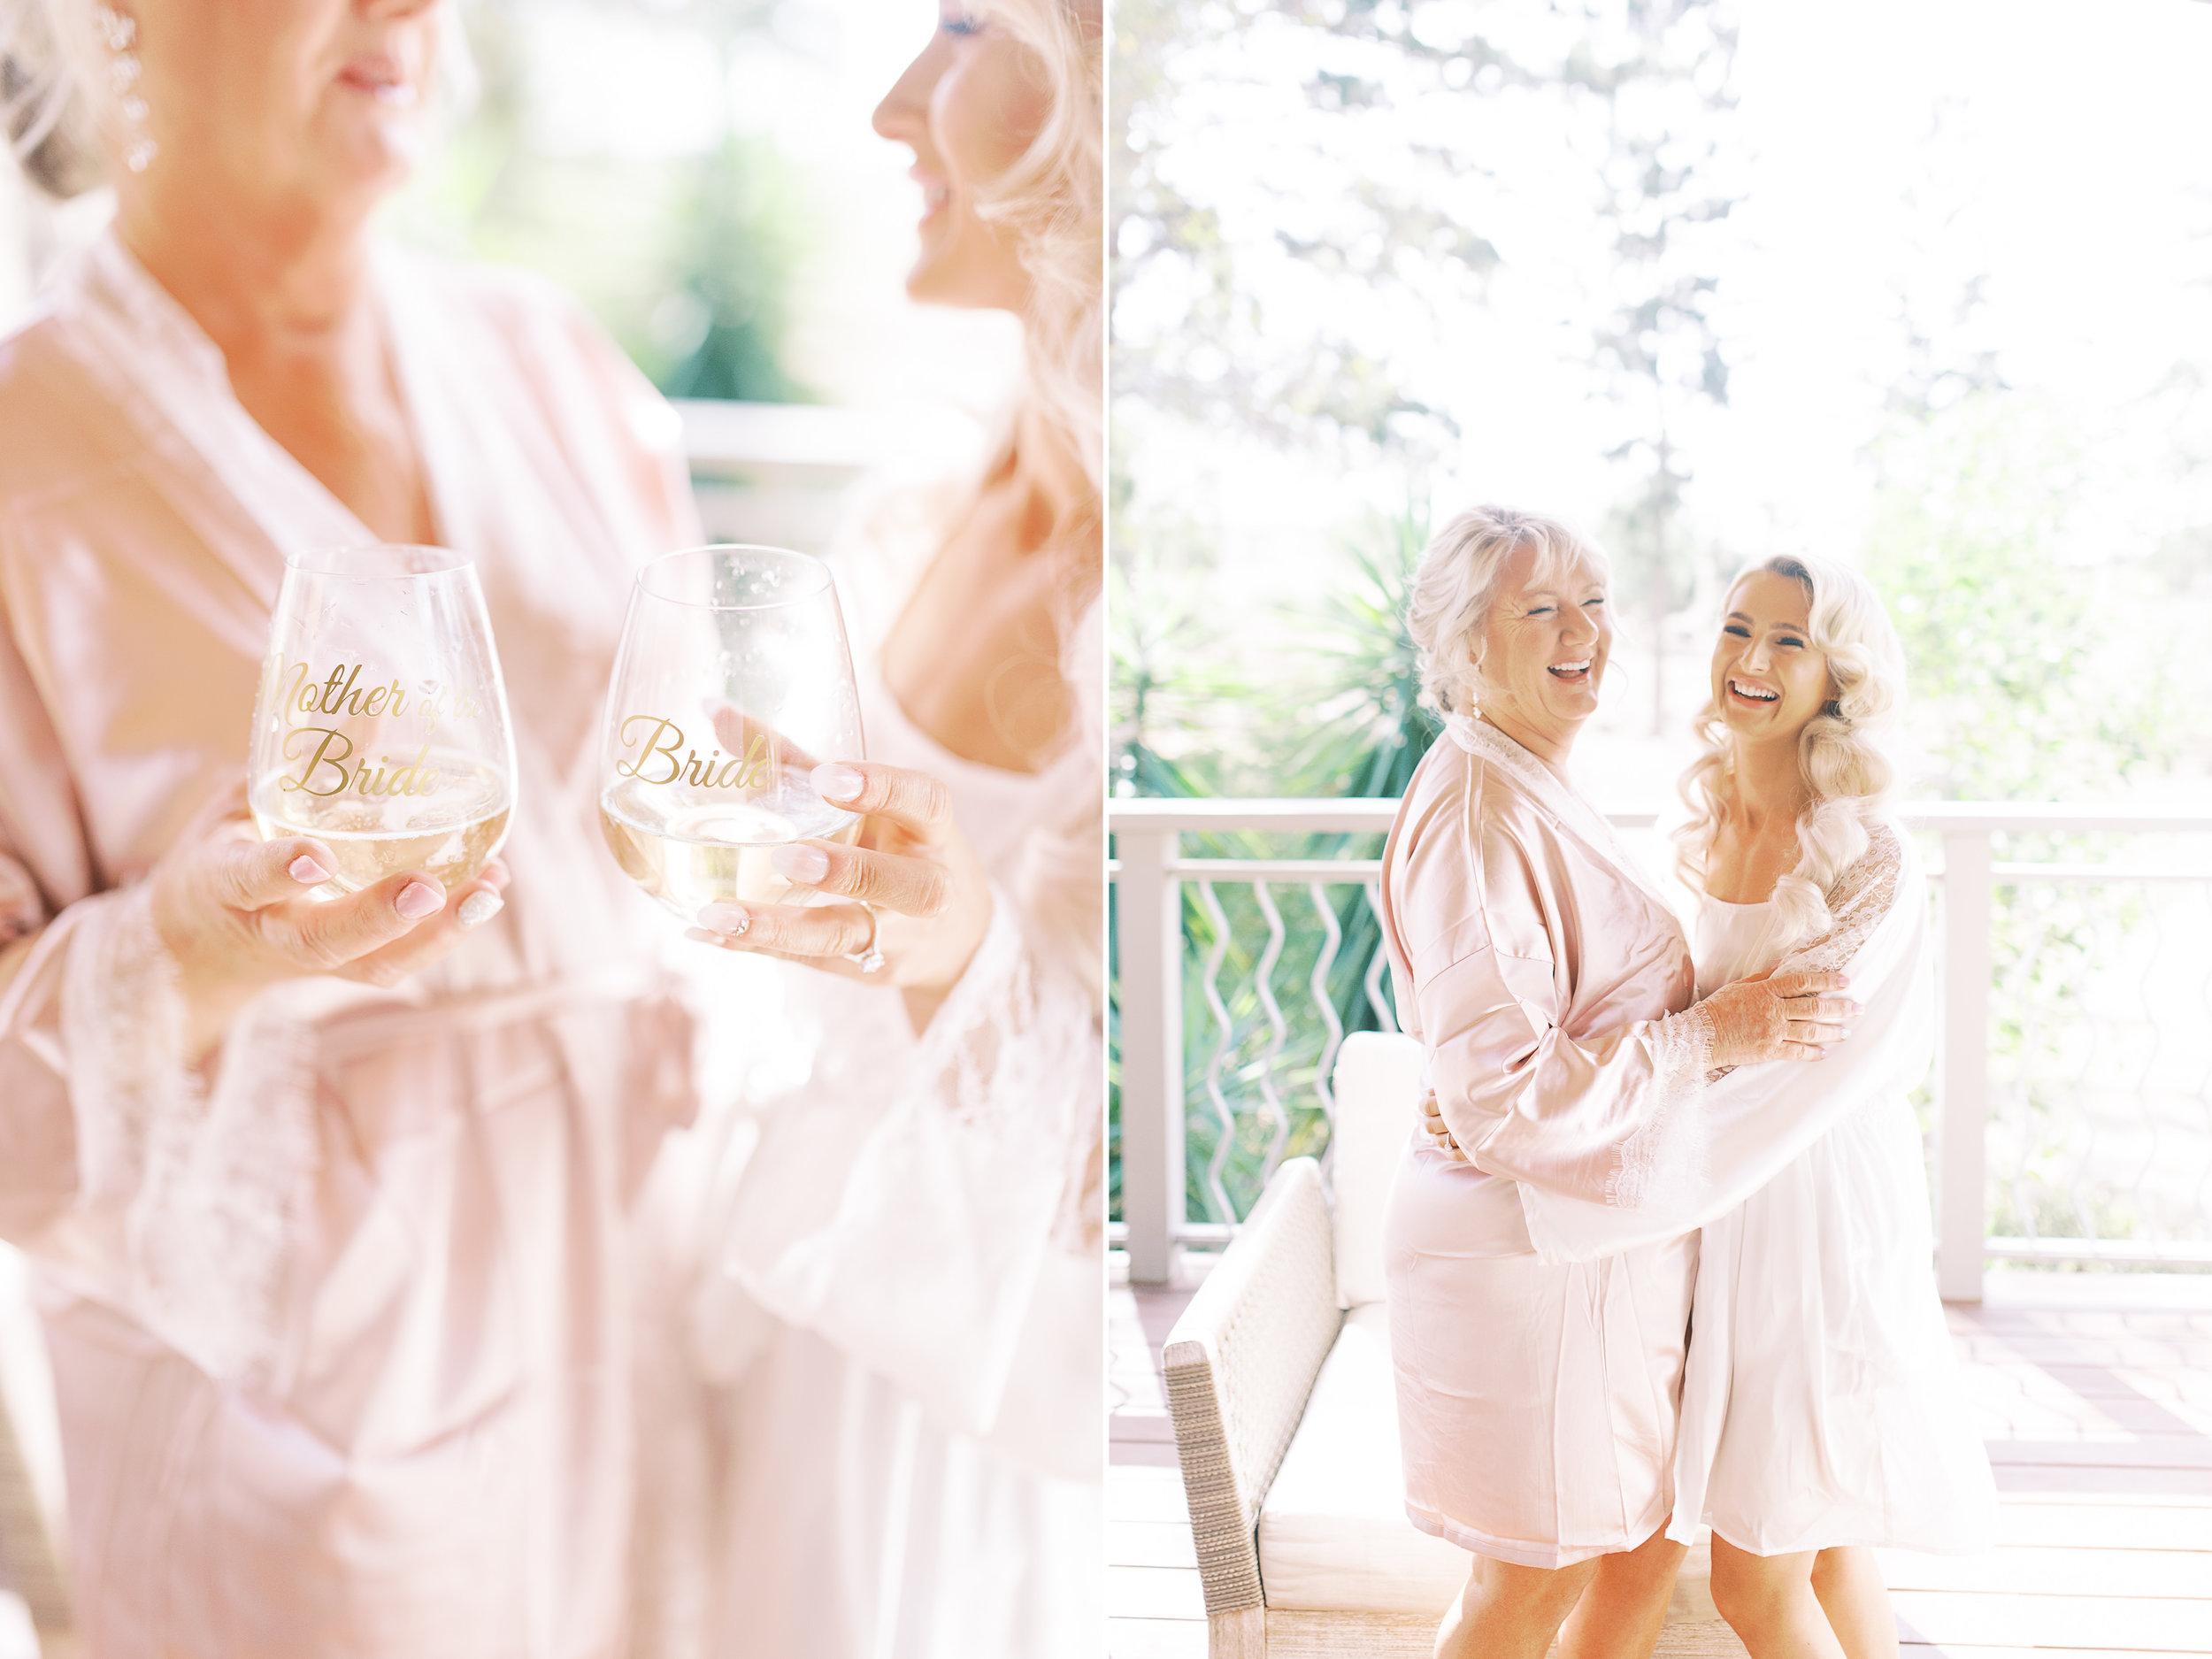 kooroomba-lavendar-farm-film-photography-wedding-photography-romantic-04.jpg